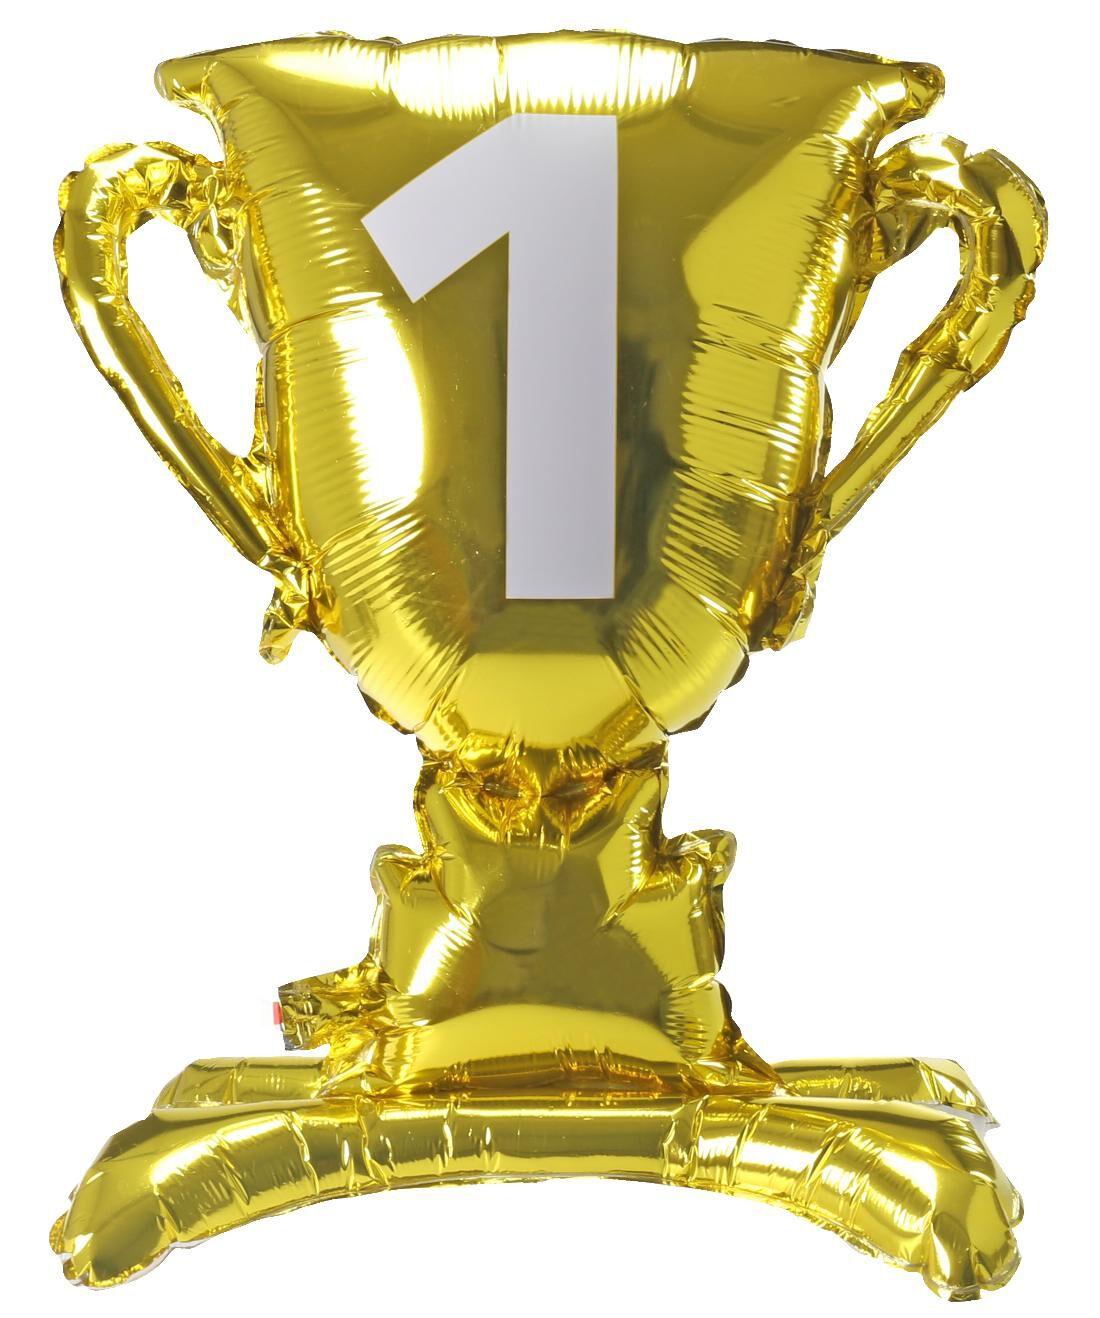 HEMA Folieballon 65 Cm - Gouden Cup